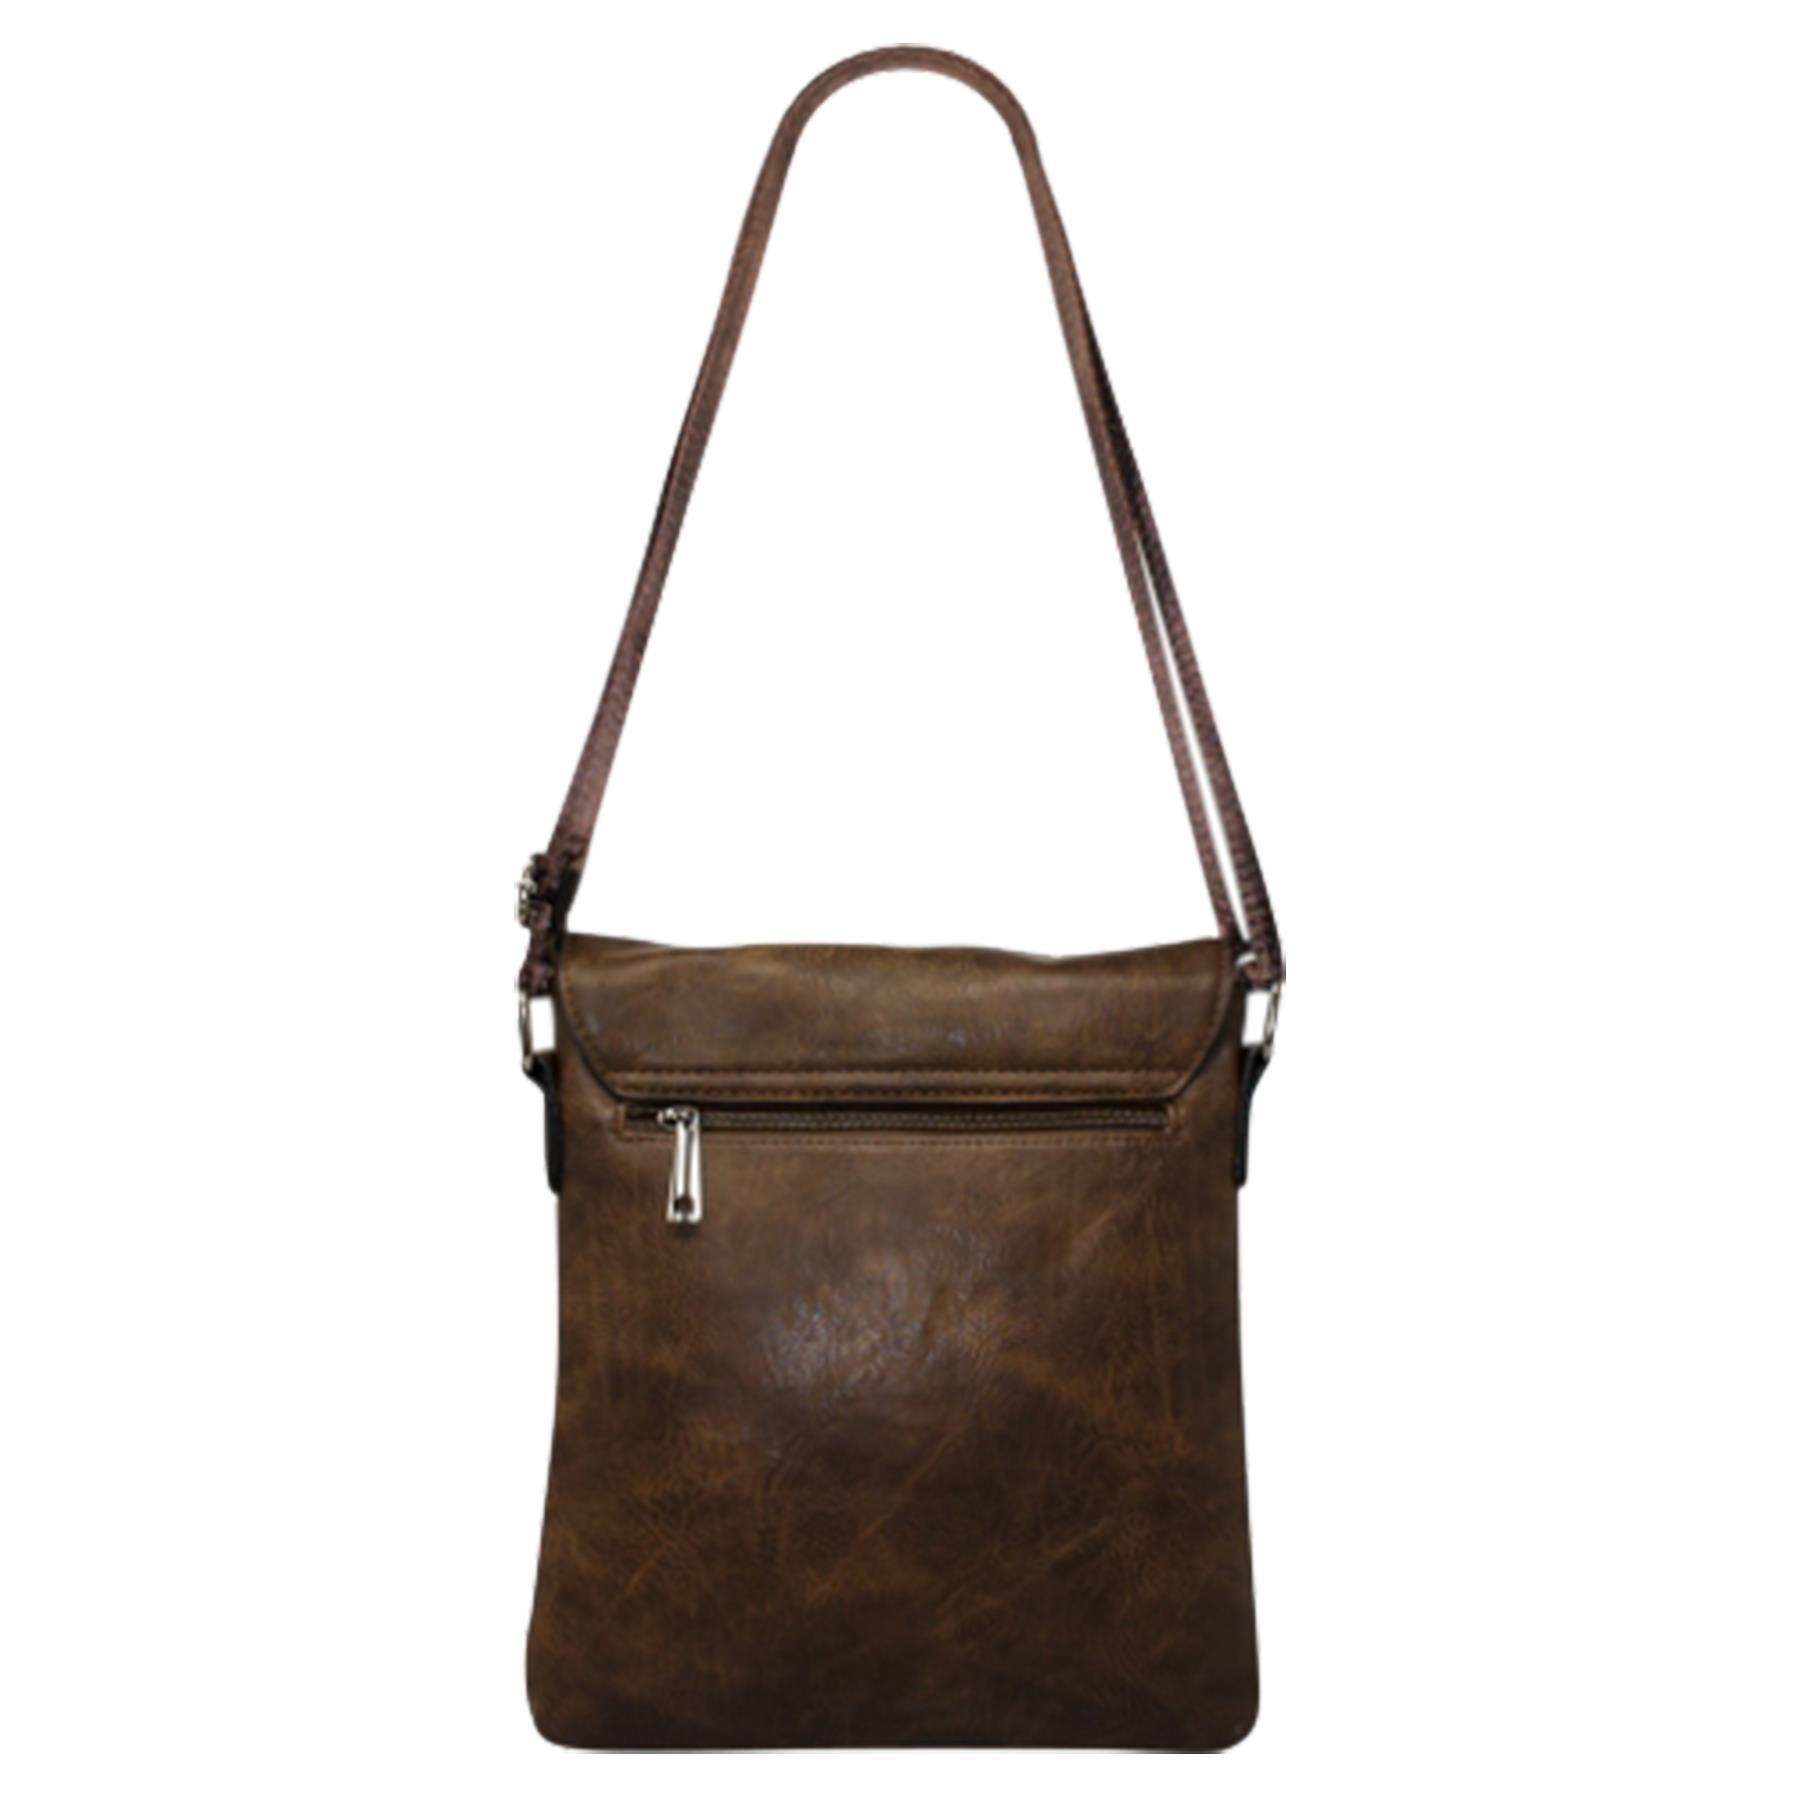 New-Plain-Faux-Leather-Men-s-Travel-Casual-Flap-Over-Messenger-Bag thumbnail 12